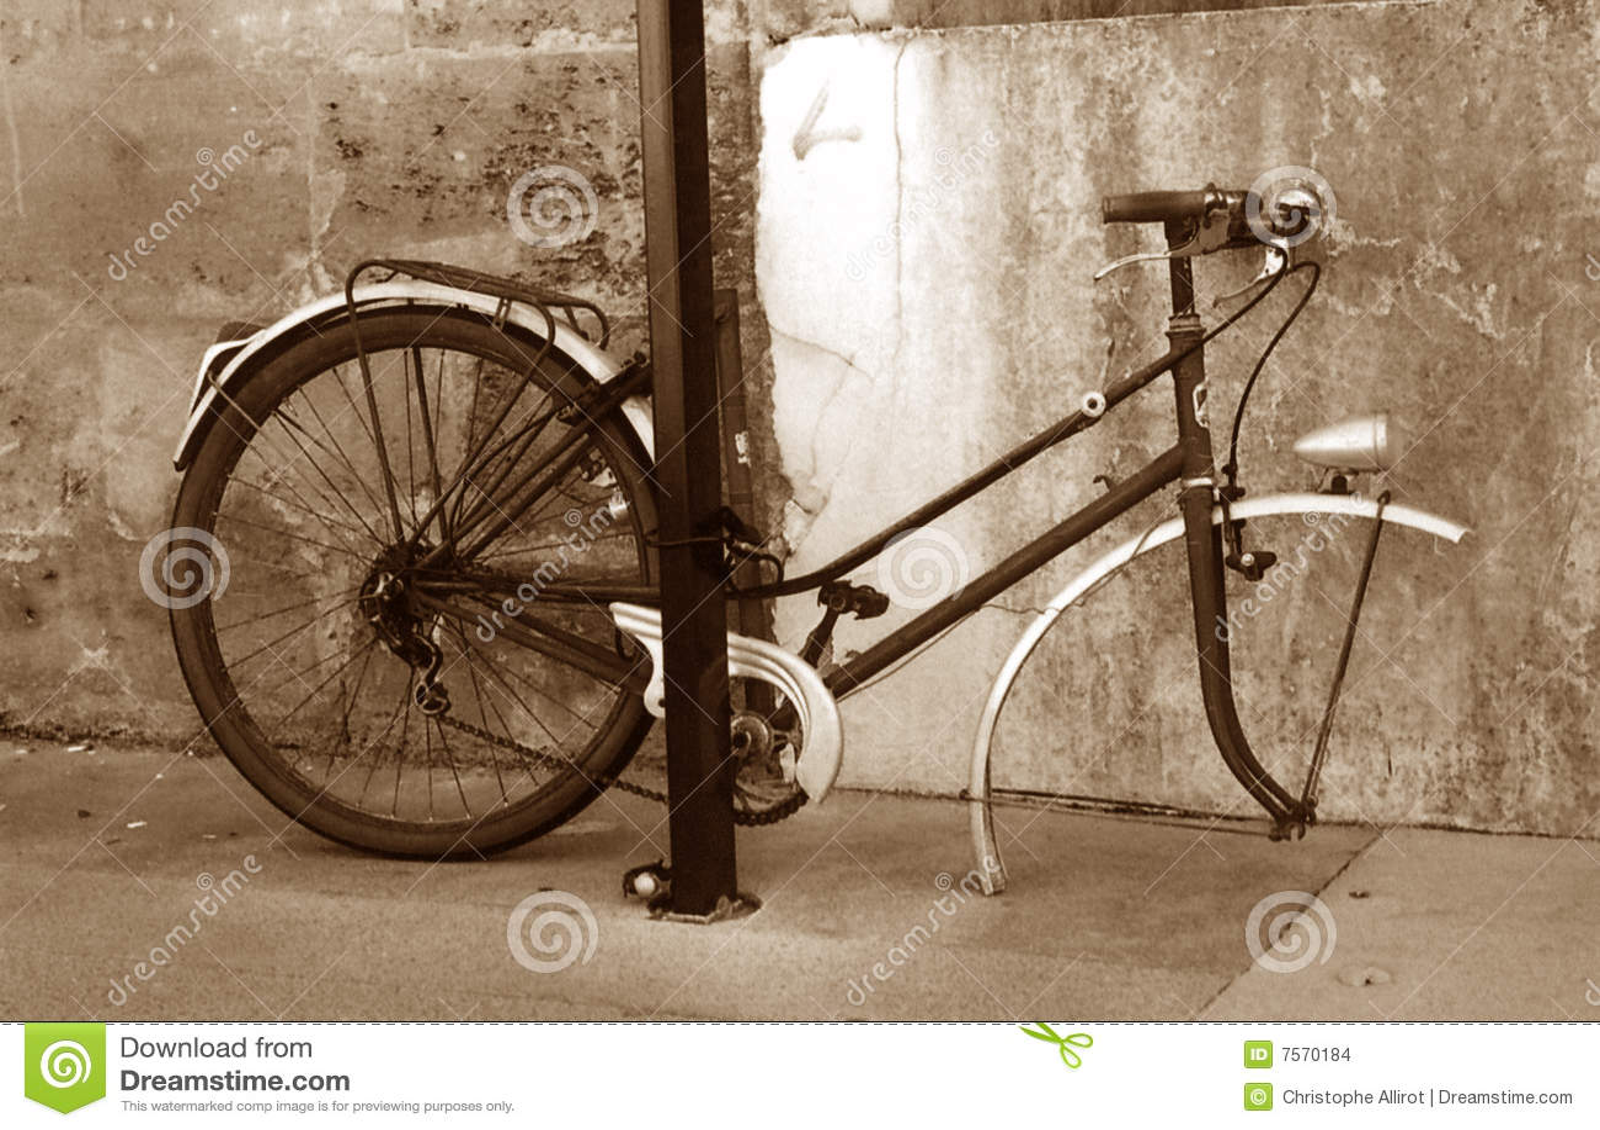 The sad bike in sepia